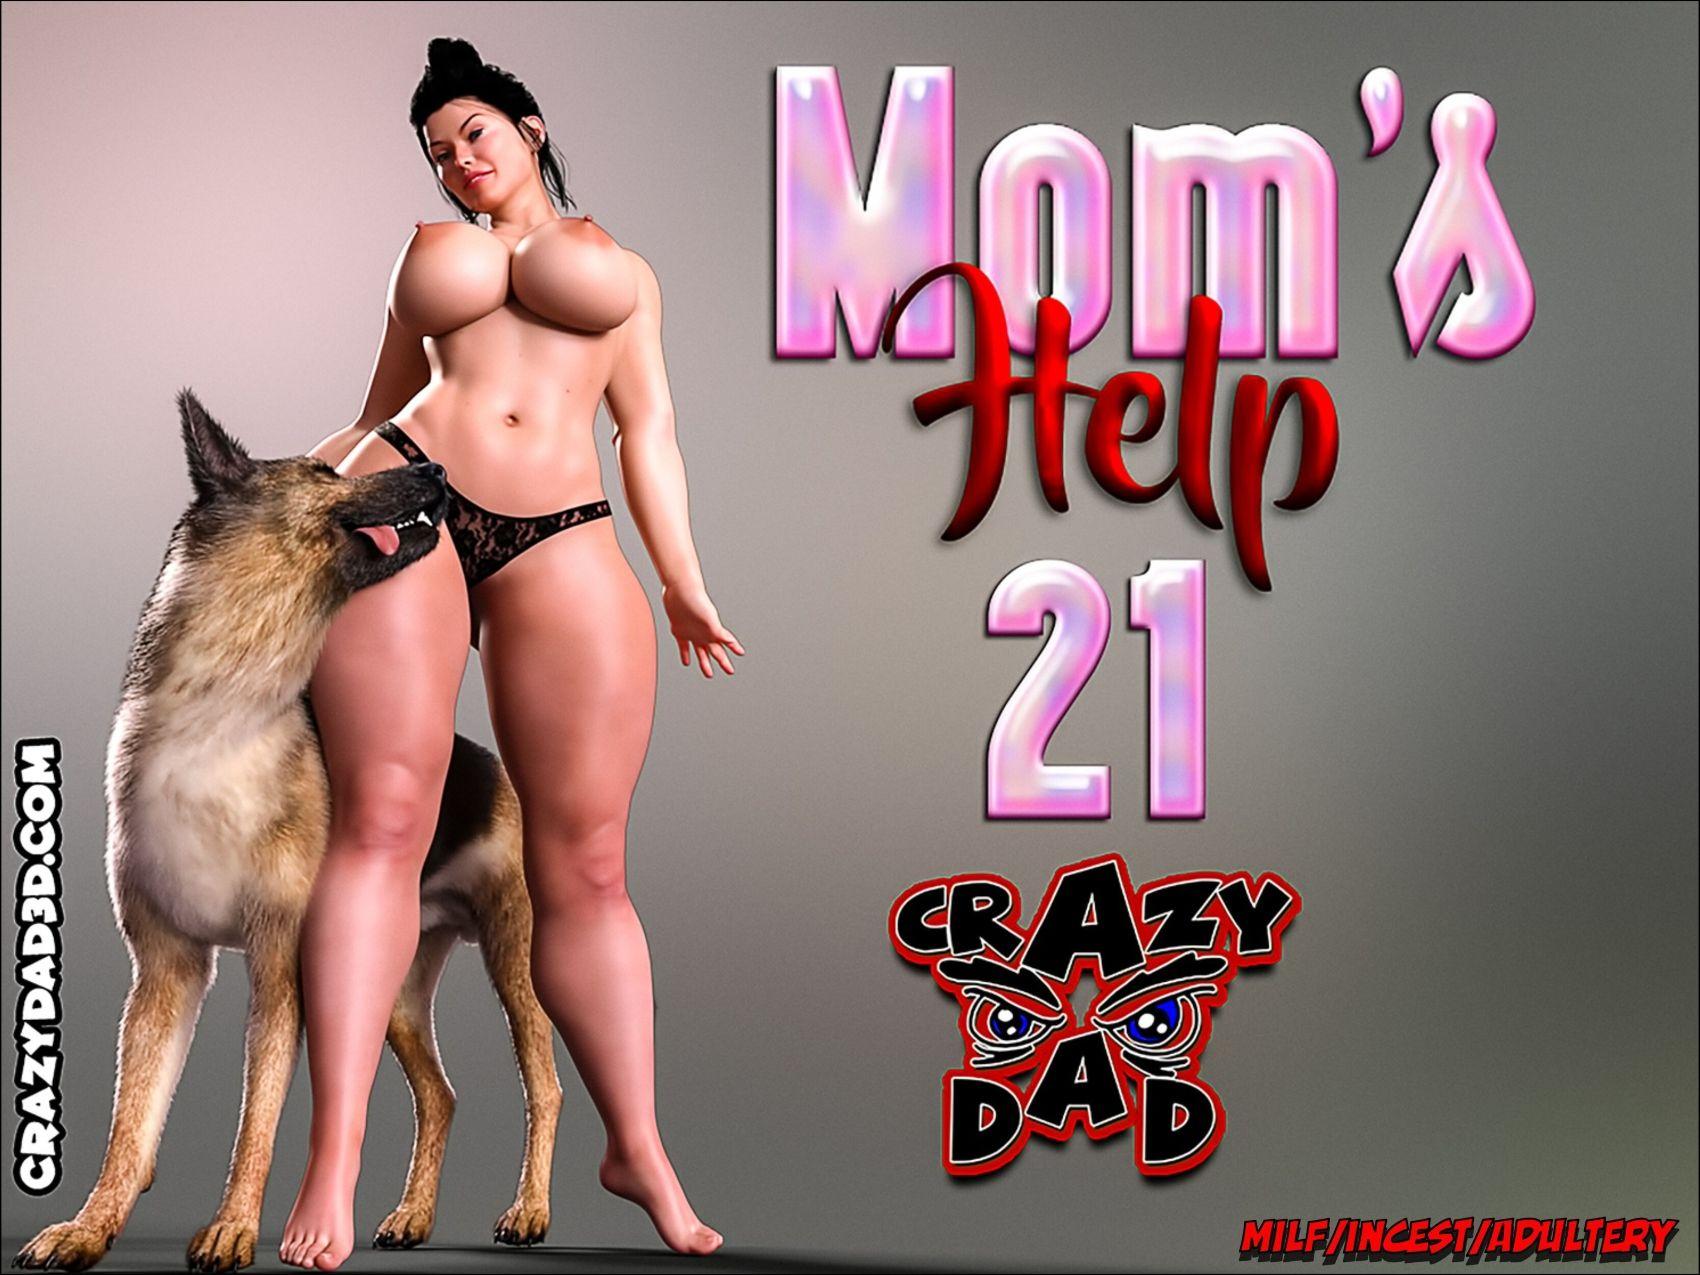 3D Henta I Porn mom's help 21 – crazydad3d complete! | freeadultcomix | free